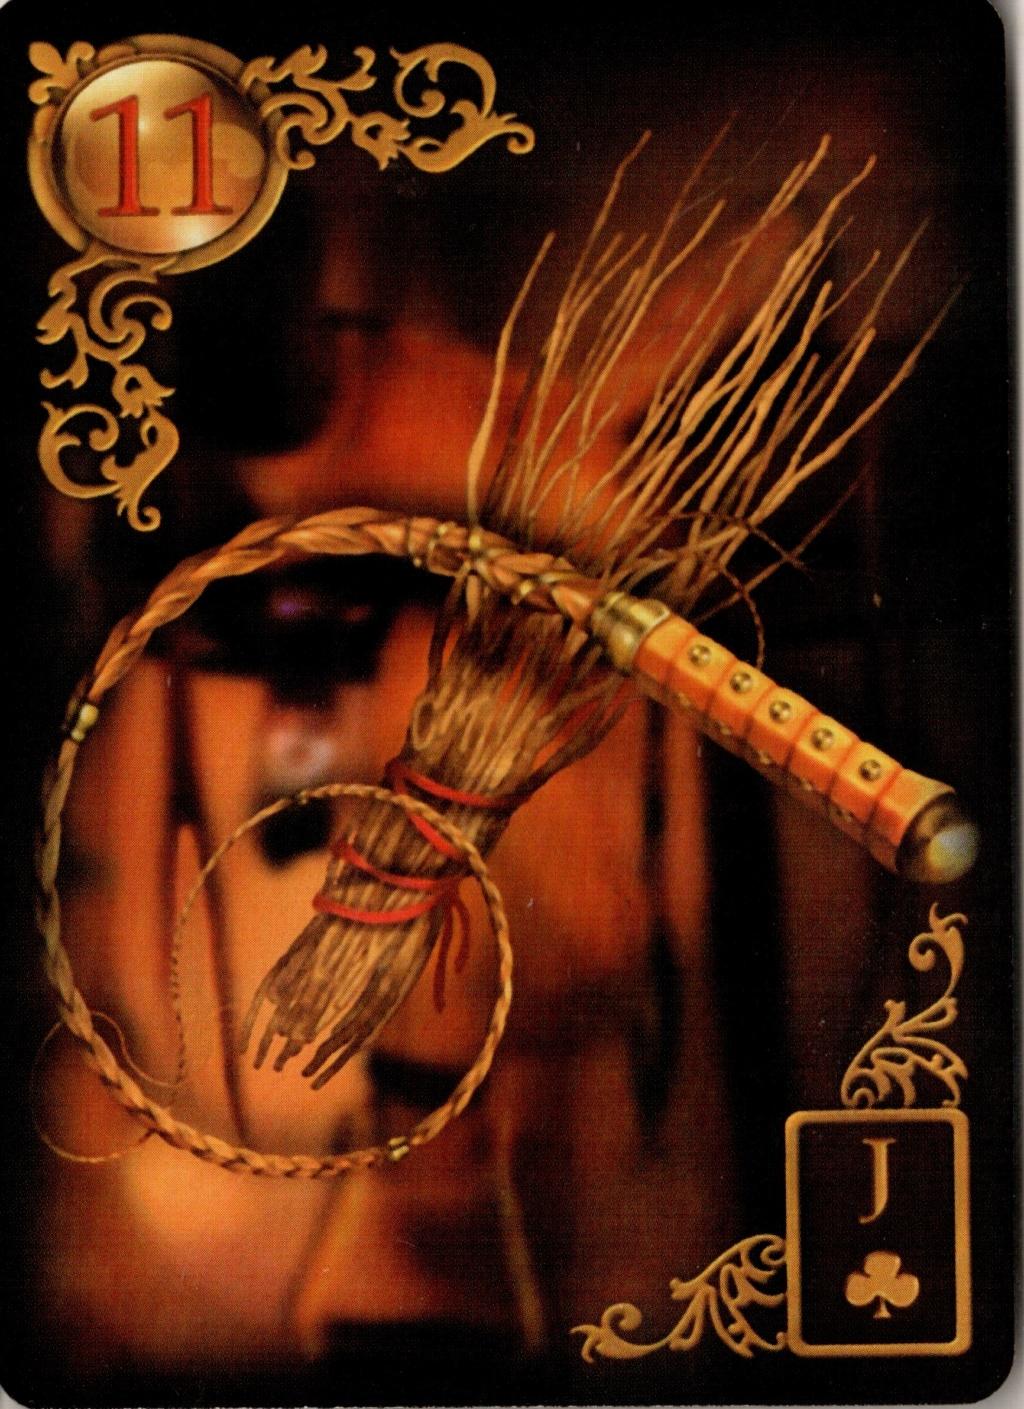 Золотые мечты Ленорман (Расширенное издание) | Gilded Reverie Lenormand. Галерея.  11_a10